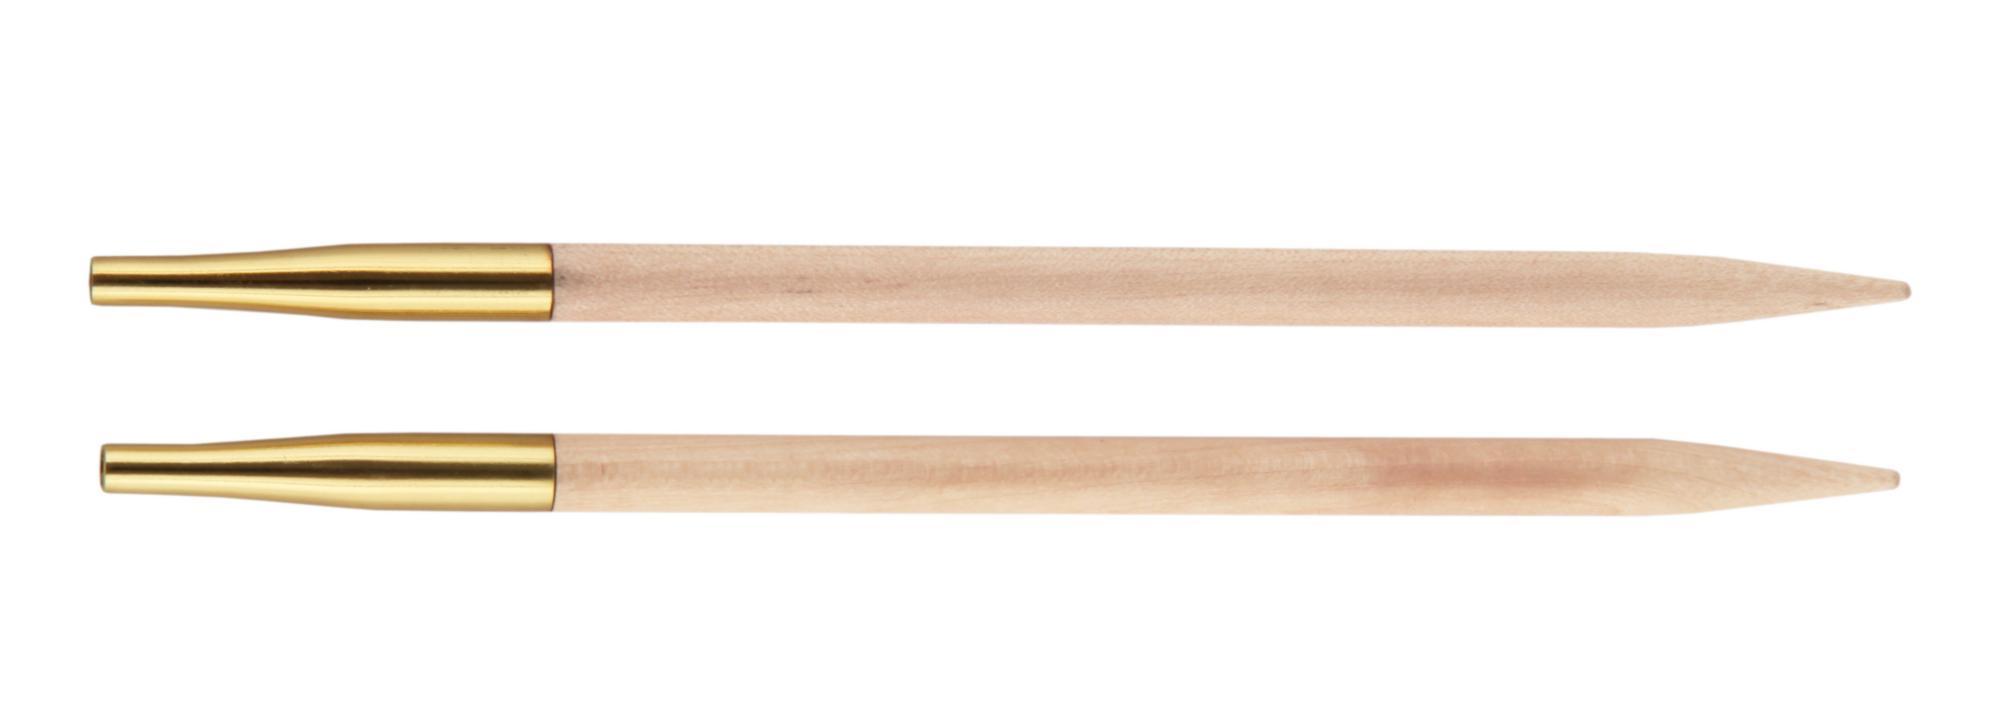 Спицы съемные Basix Birch Wood KnitPro, 35641, 7.00 мм